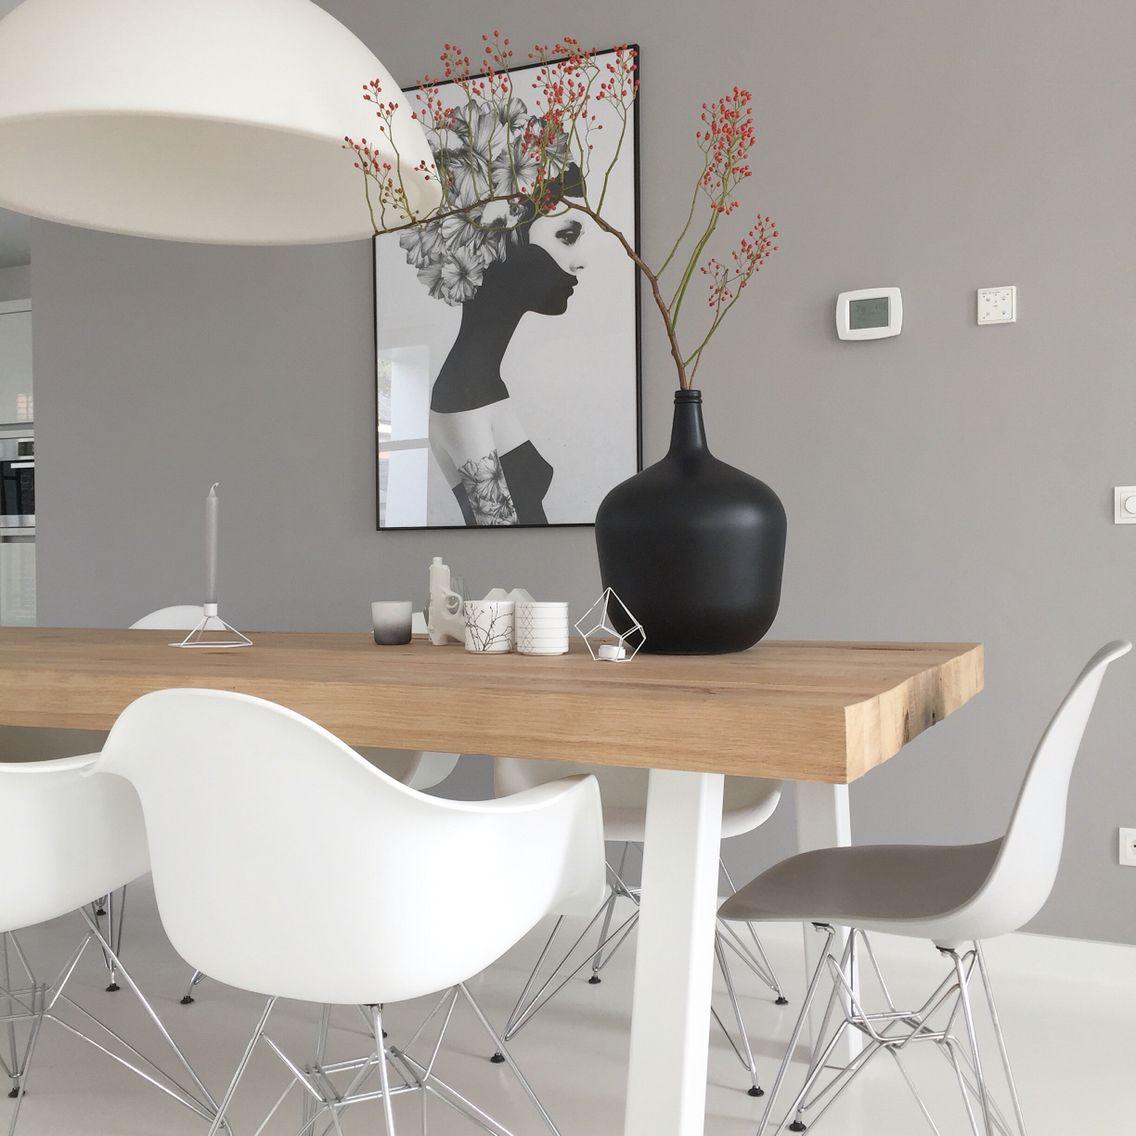 Charming Ruben Ireland Poster Walldecoration Eames Chairs Eethoek Houten Balken HK  Living Vase Rozenbotteltak